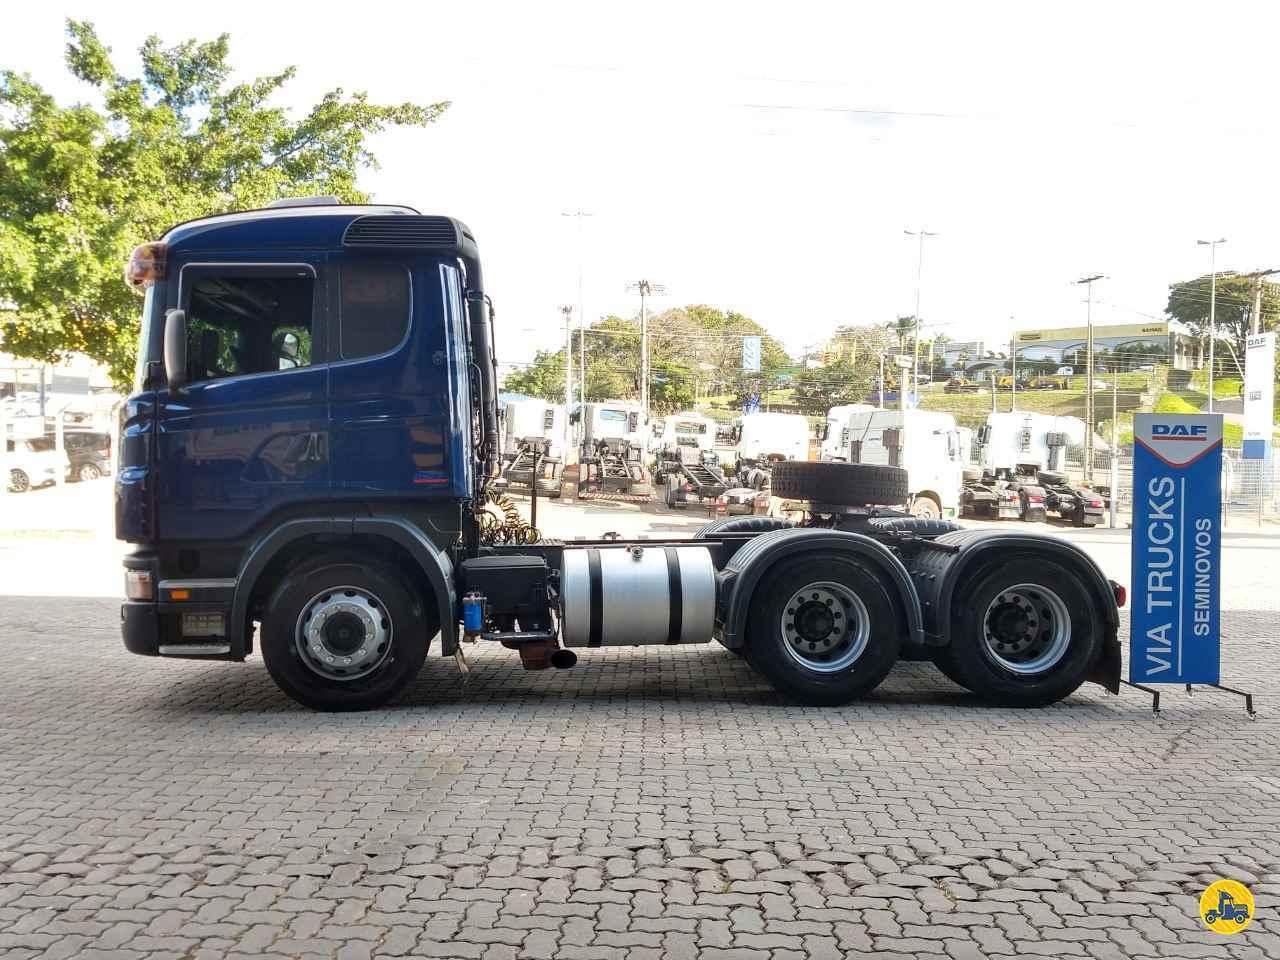 SCANIA SCANIA 420 1241882km 2009/2009 Via Trucks - DAF